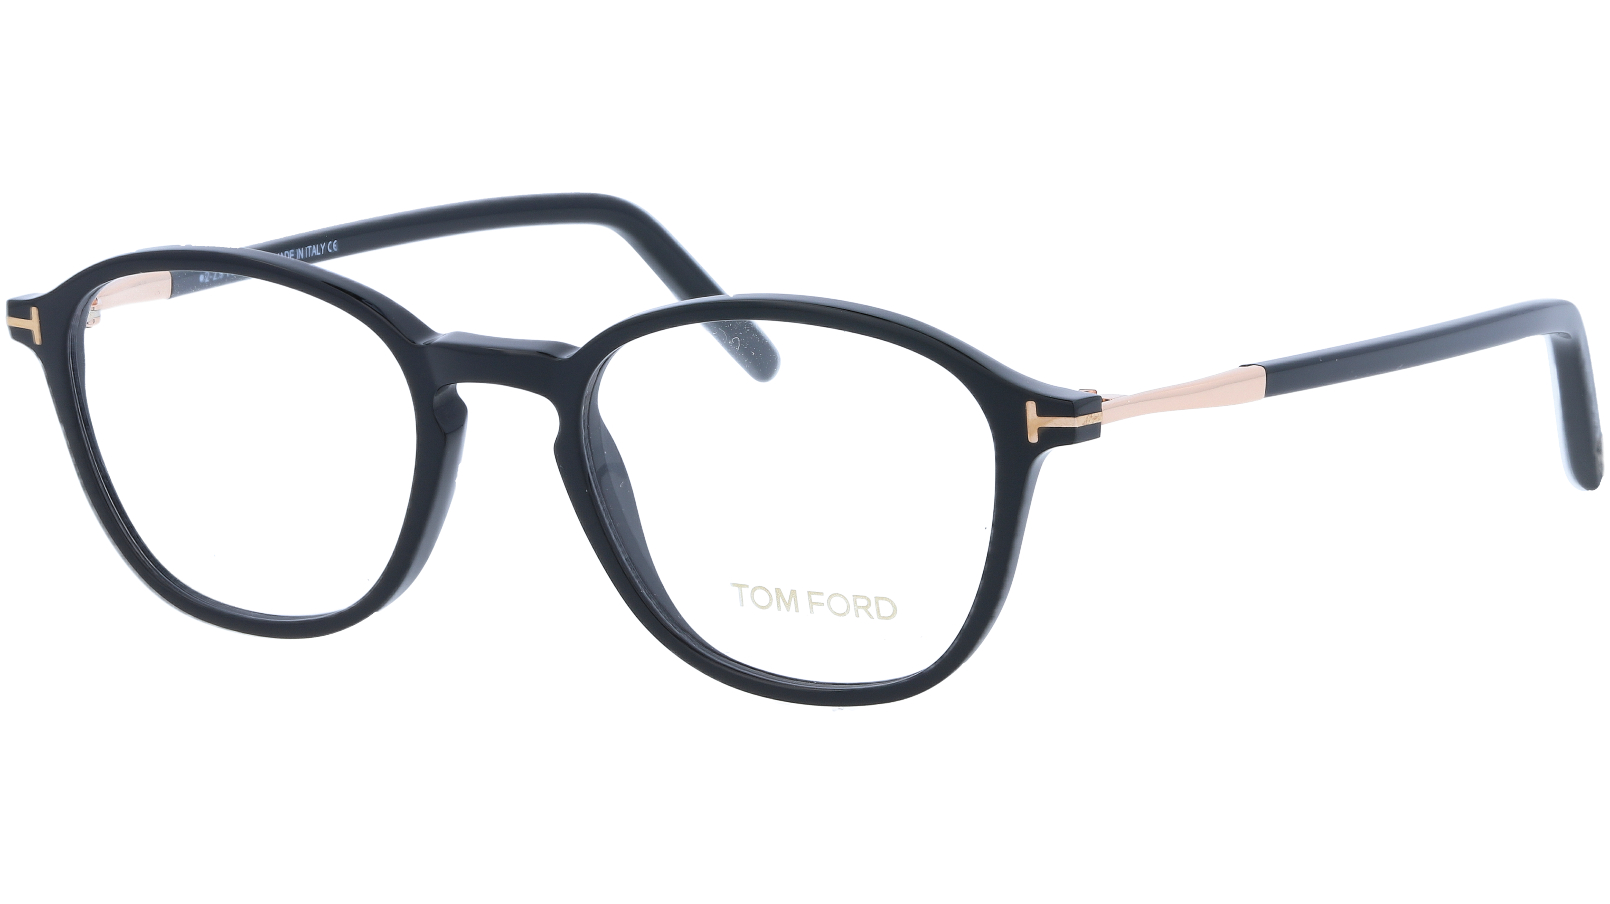 Tom Ford TF5397 001 49 Black Glasses